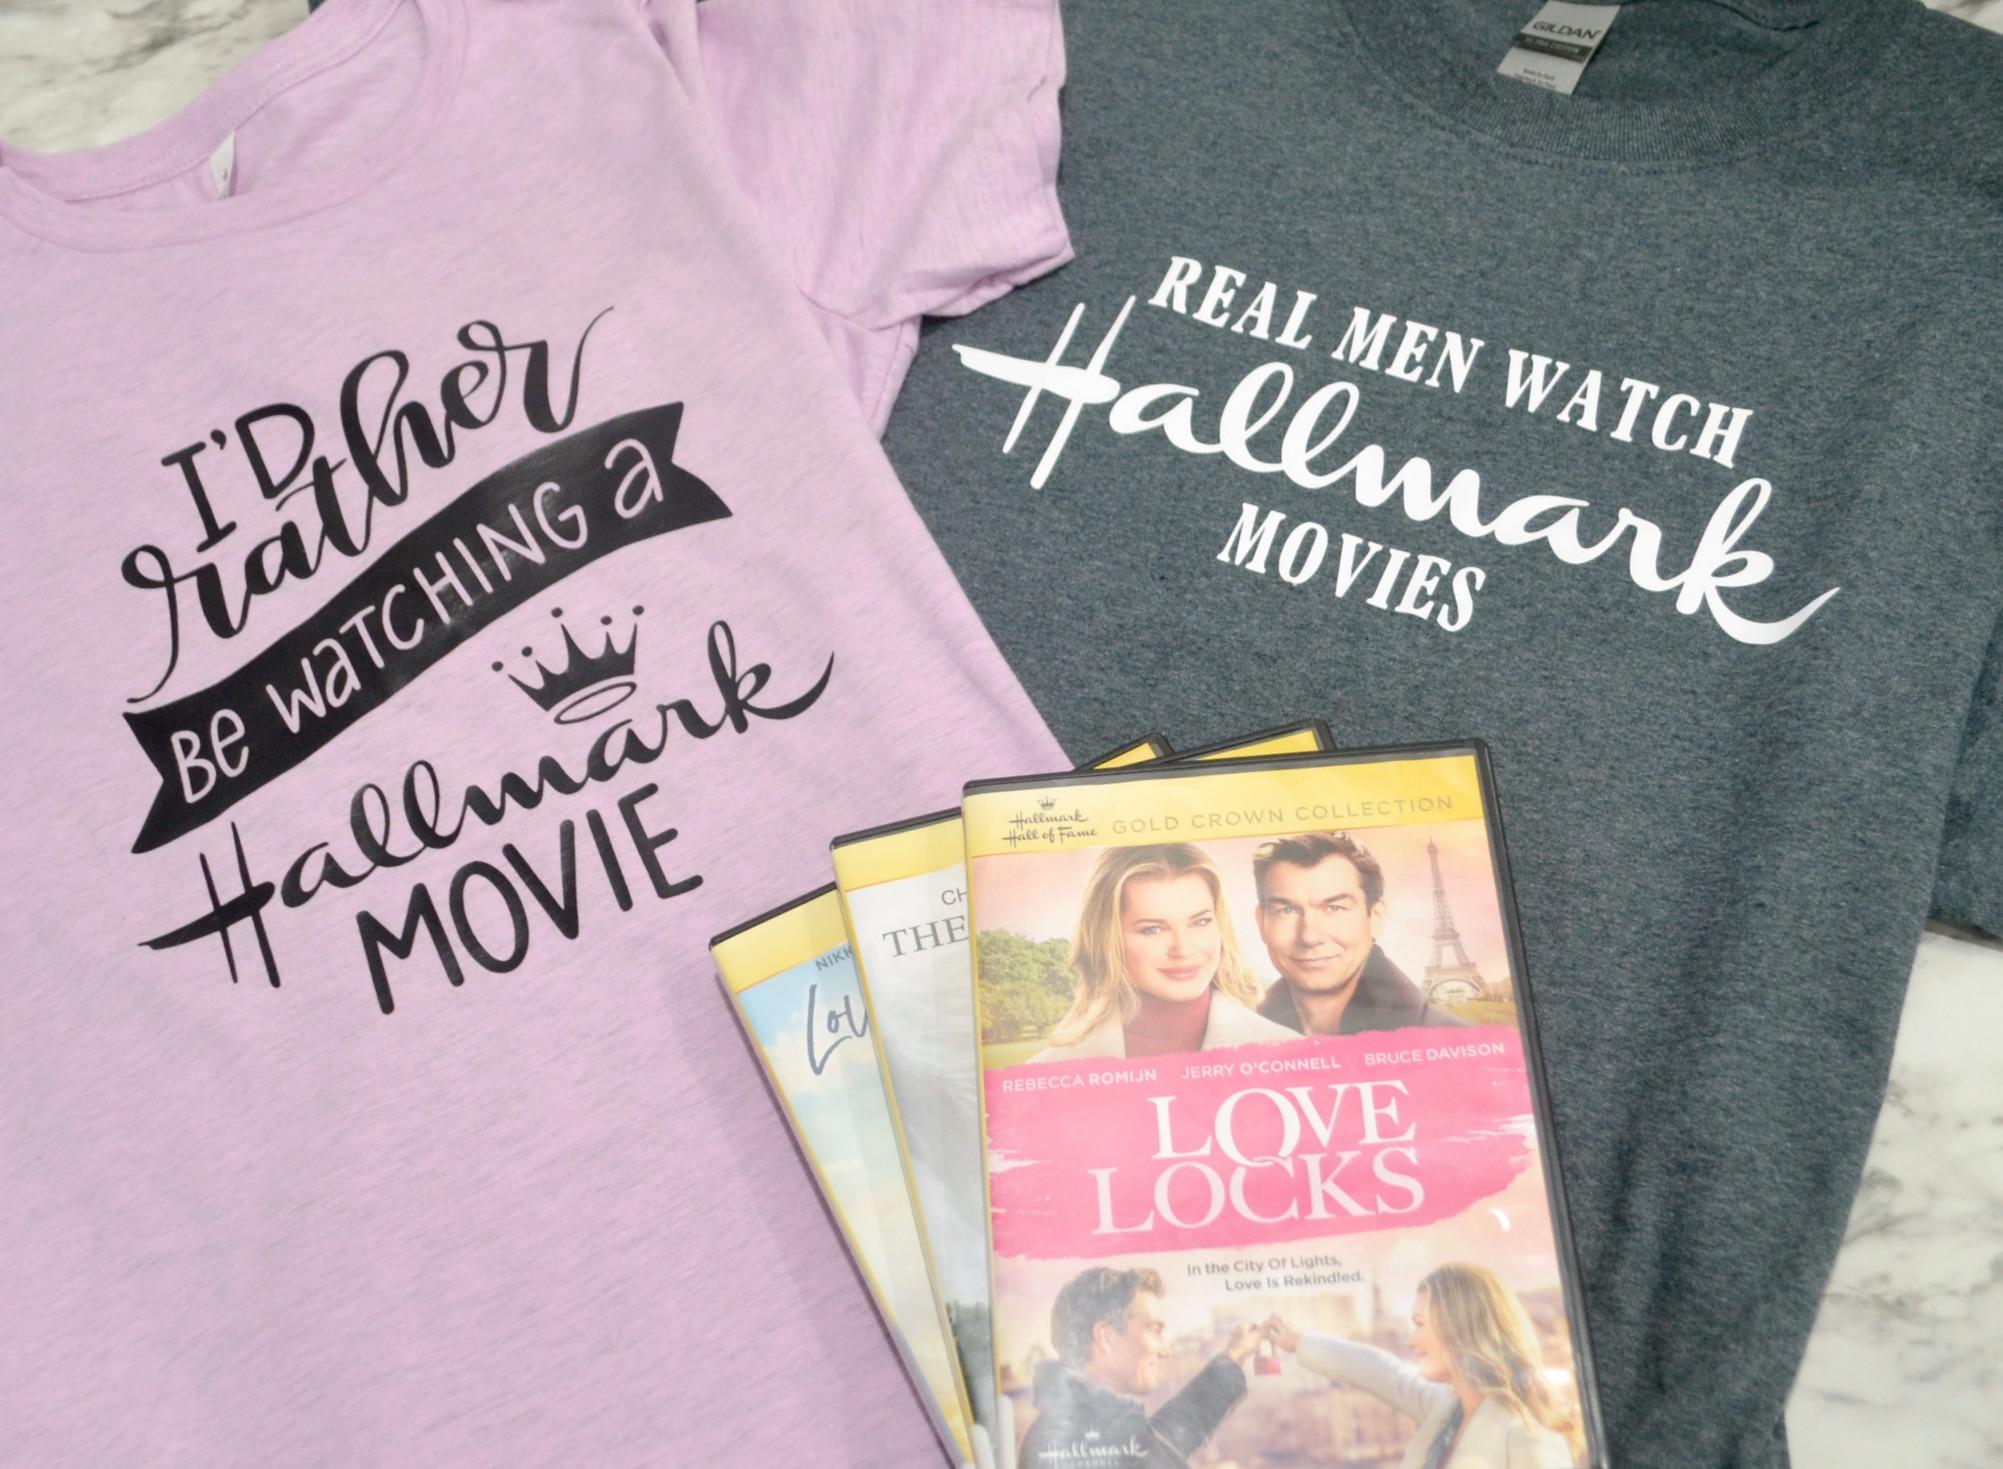 Hallmark Christmas Shirt Svg.Diy Hallmark Movie Fan T Shirts Free Cut Files Amy Latta